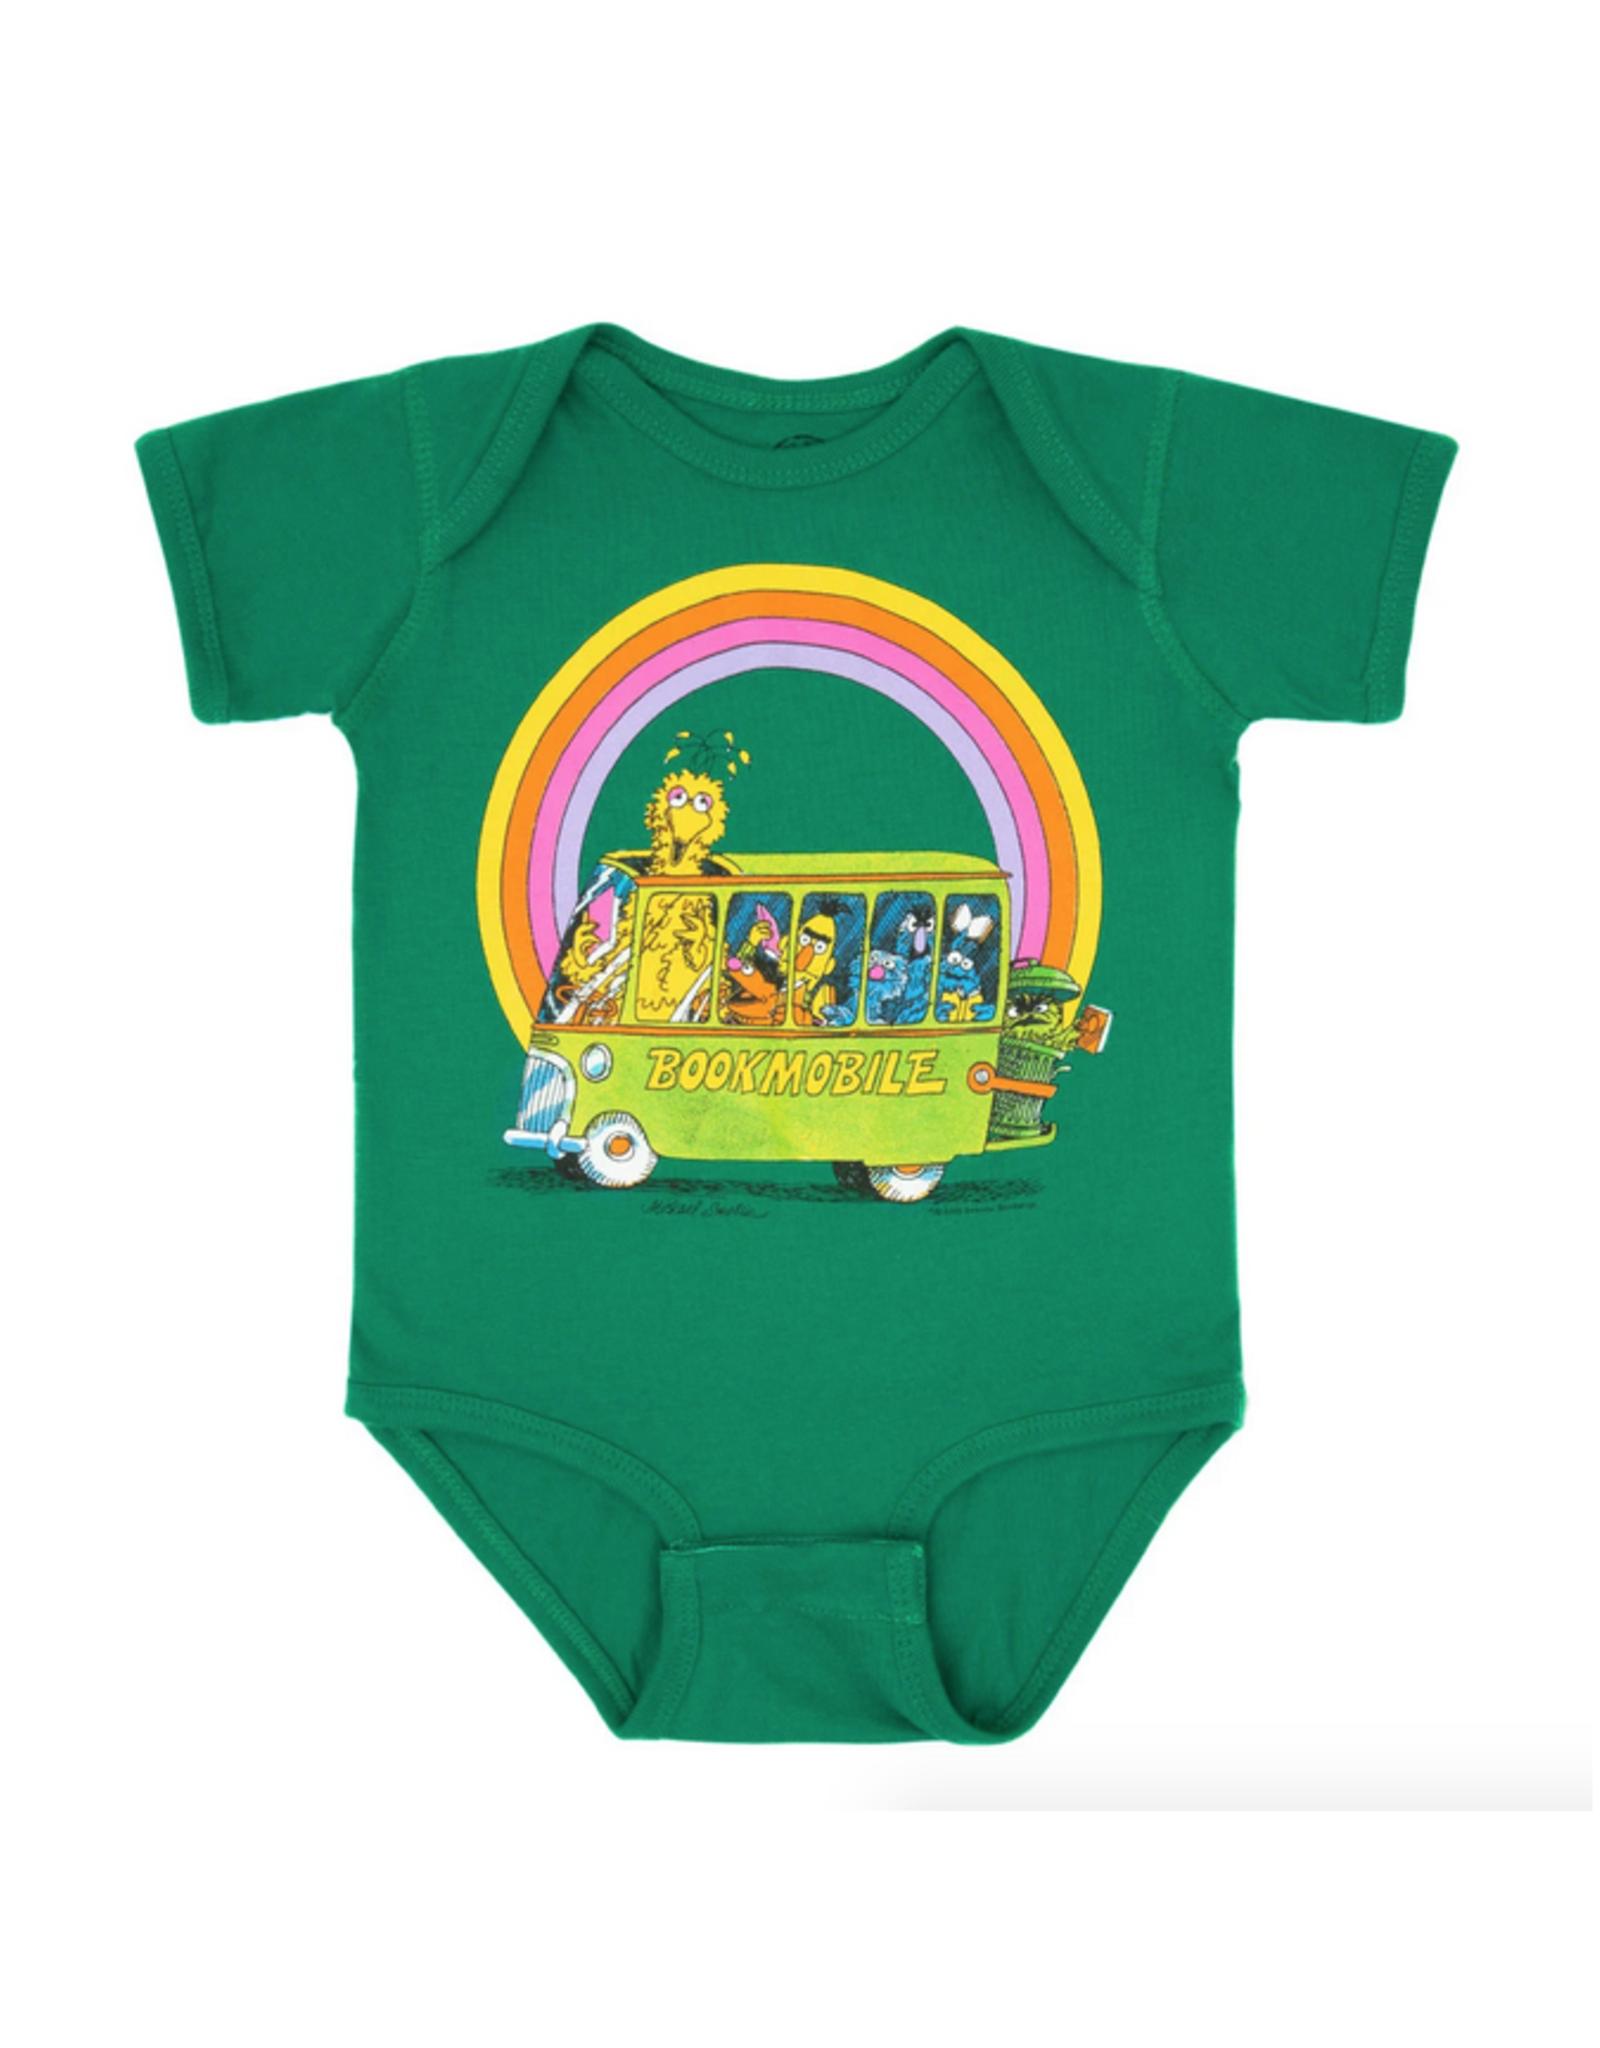 Sesame Street Bookmobile Onesie